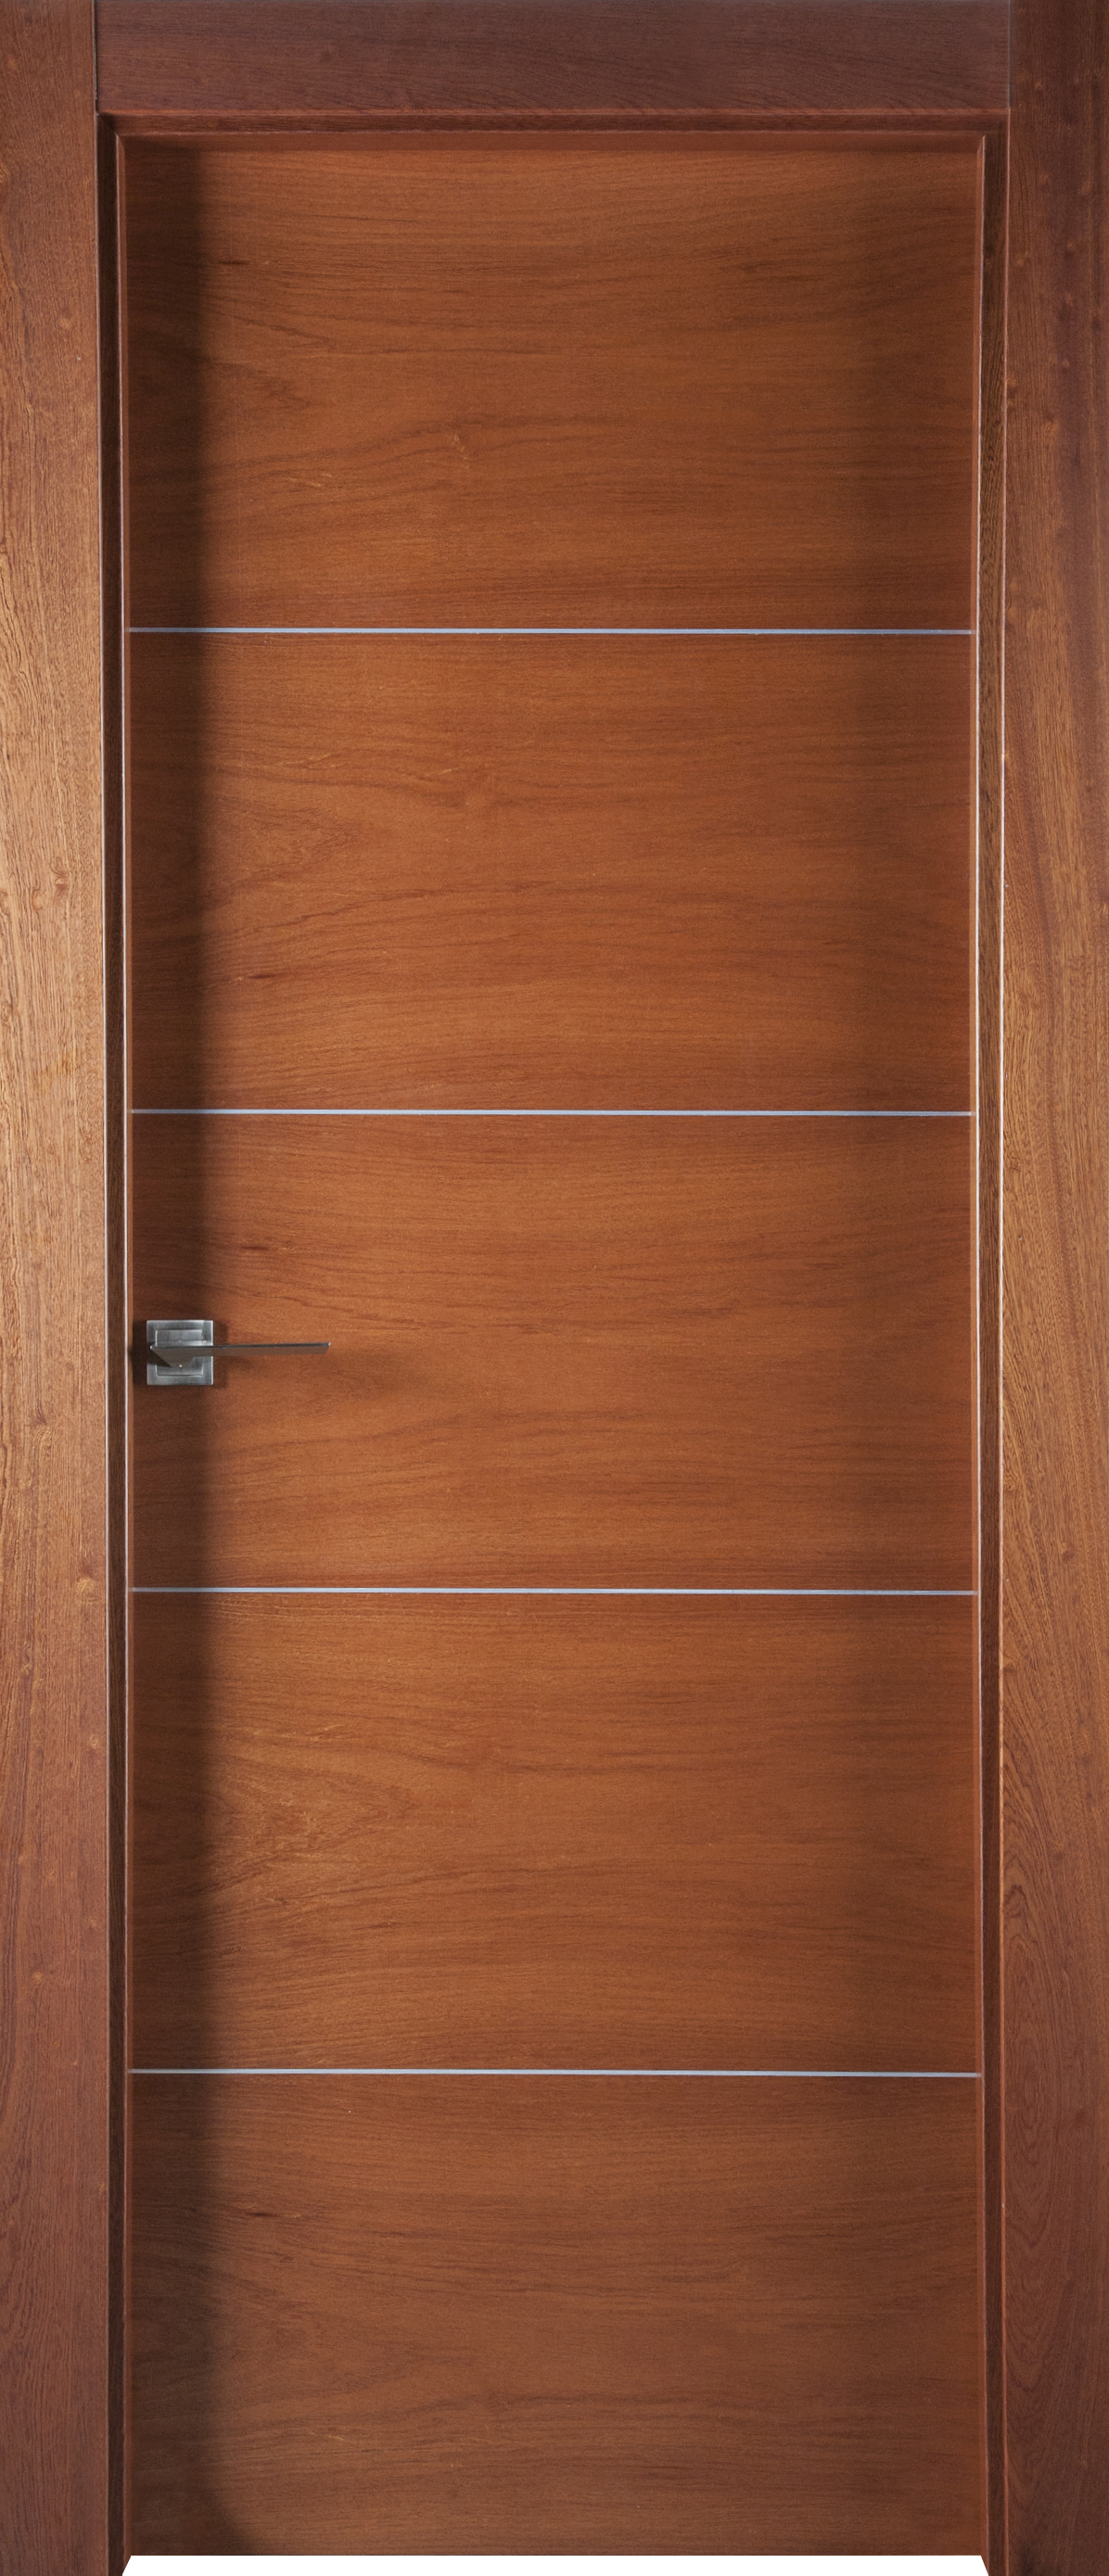 Puerta de madera uniarte vmt5 a bricoteo puertas granada for Puertas pivotantes madera